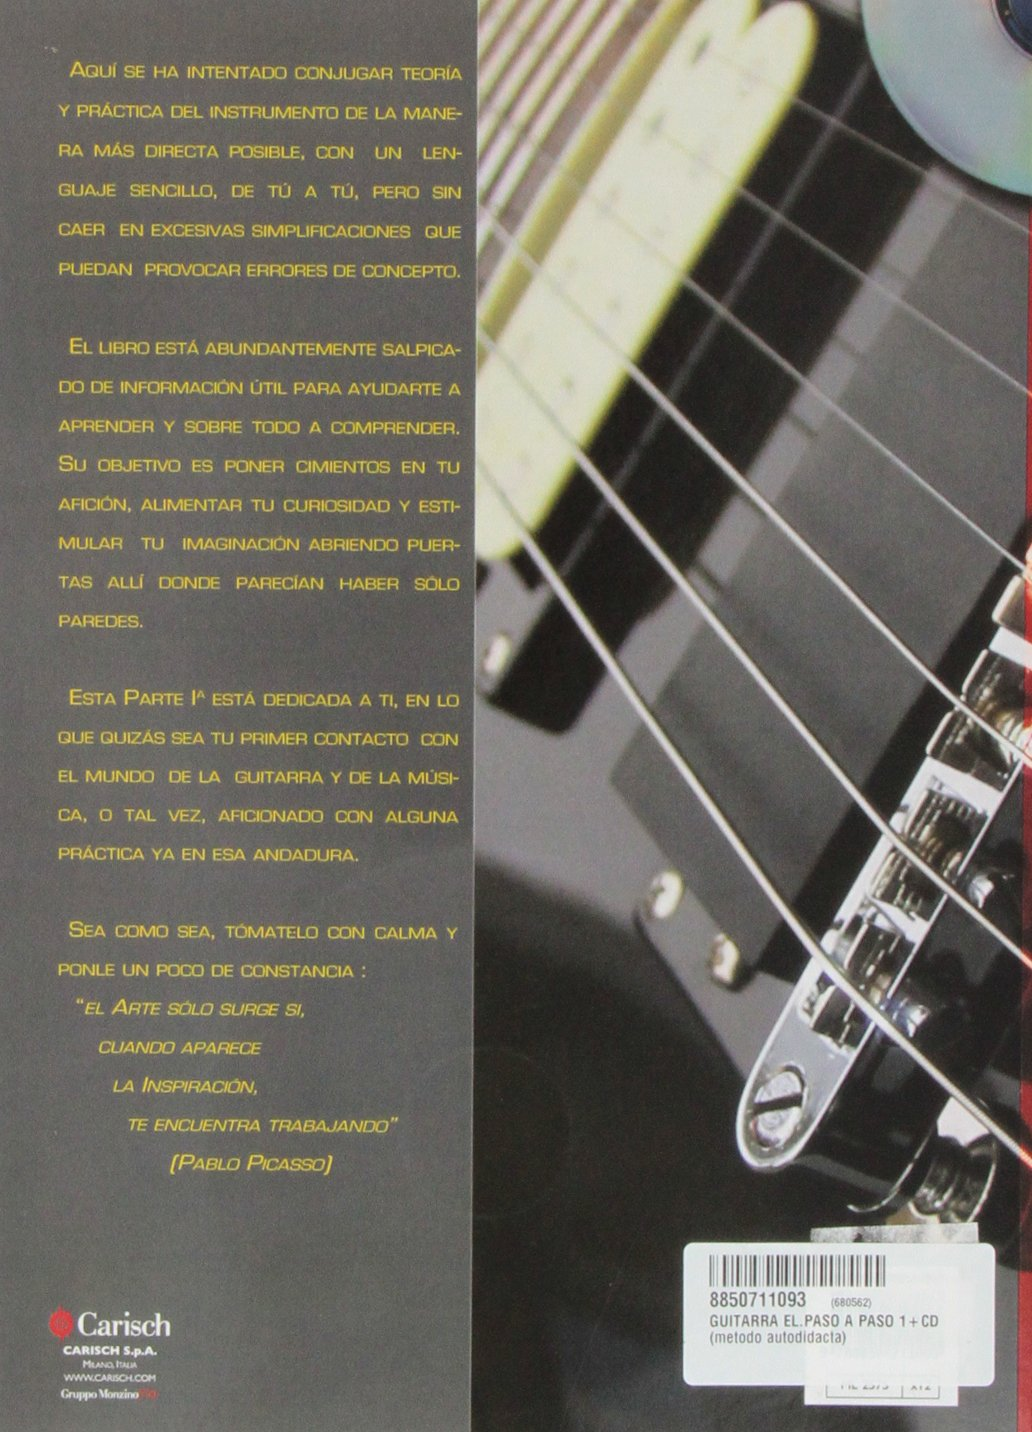 Amazon.com: Guitarra Electrica Paso A Paso 1 (9788850711093): ZAPATA y CASTERLENAS: Books